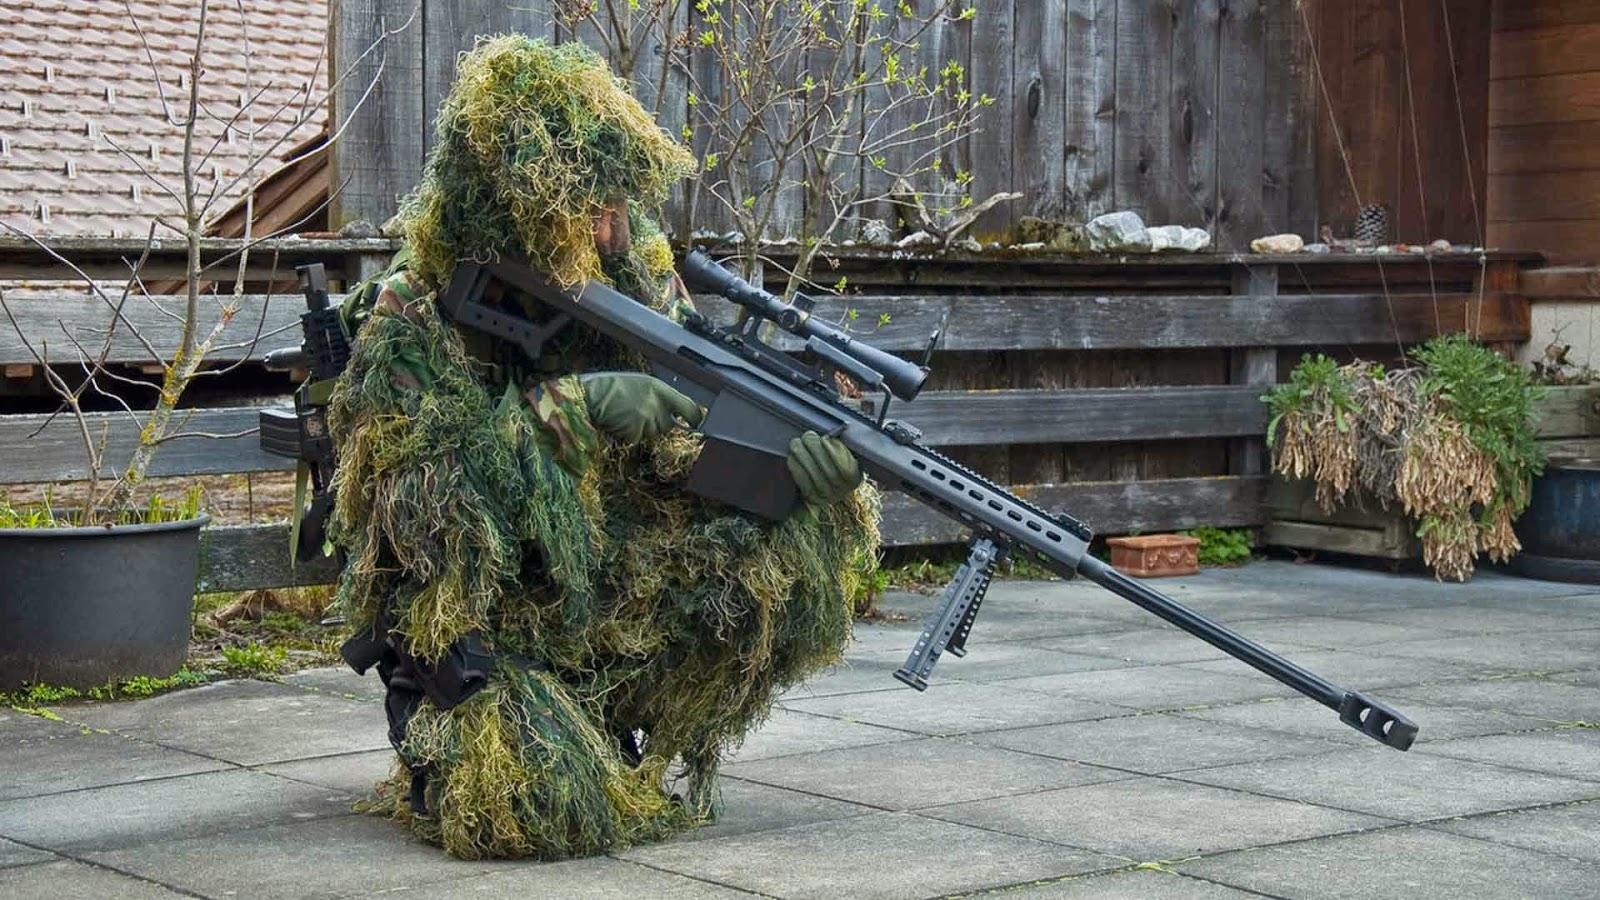 light fifty large caliber sniper rifle barrett firearms company sniper 1600x900